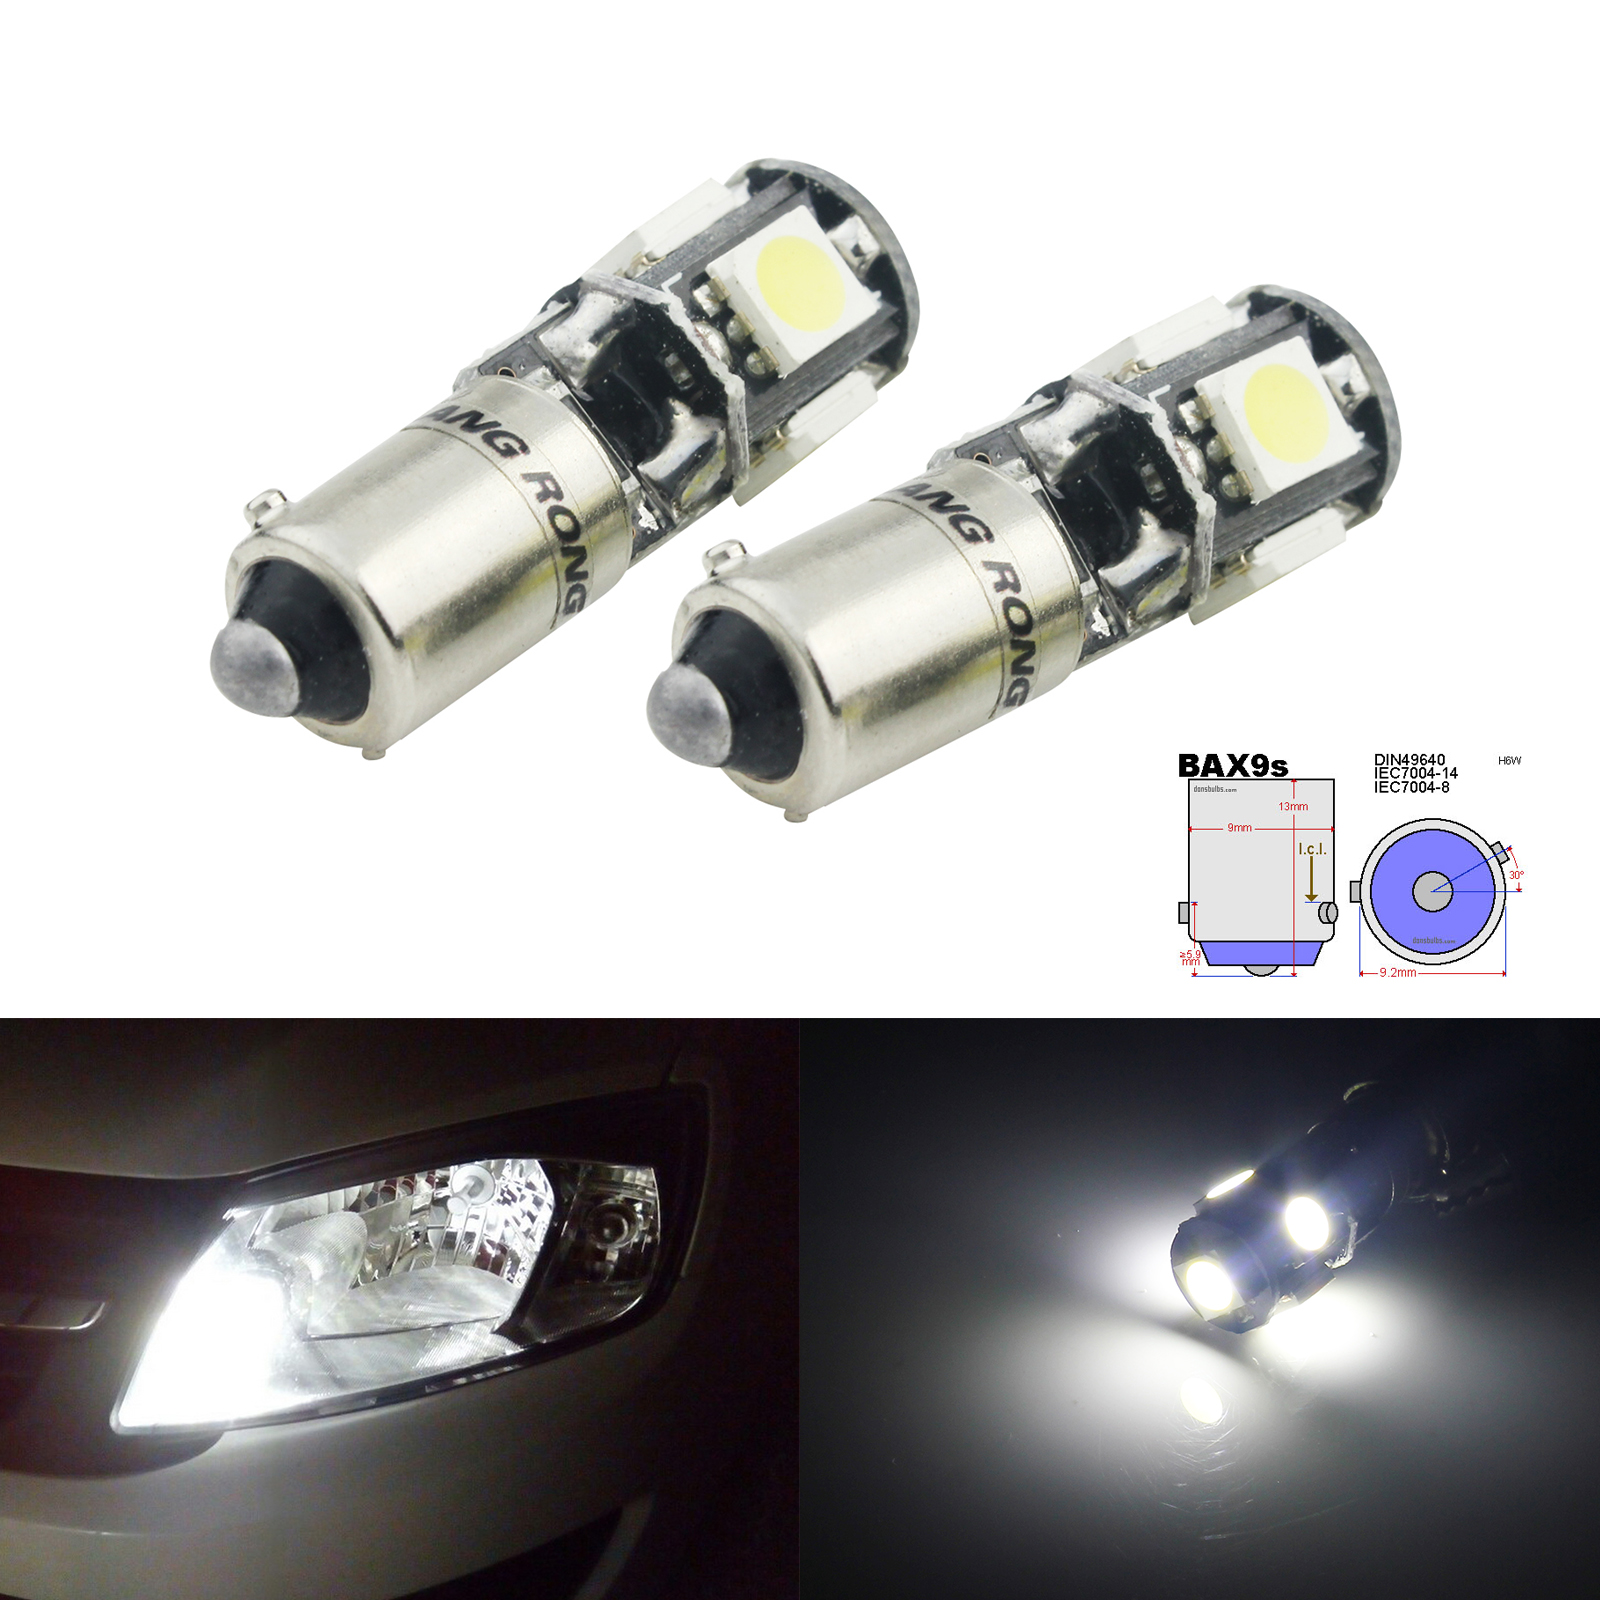 BAX9S H6W 433 434 SMD LED Side Indicator Reverse Parking Light Bulb BMW F30 F31